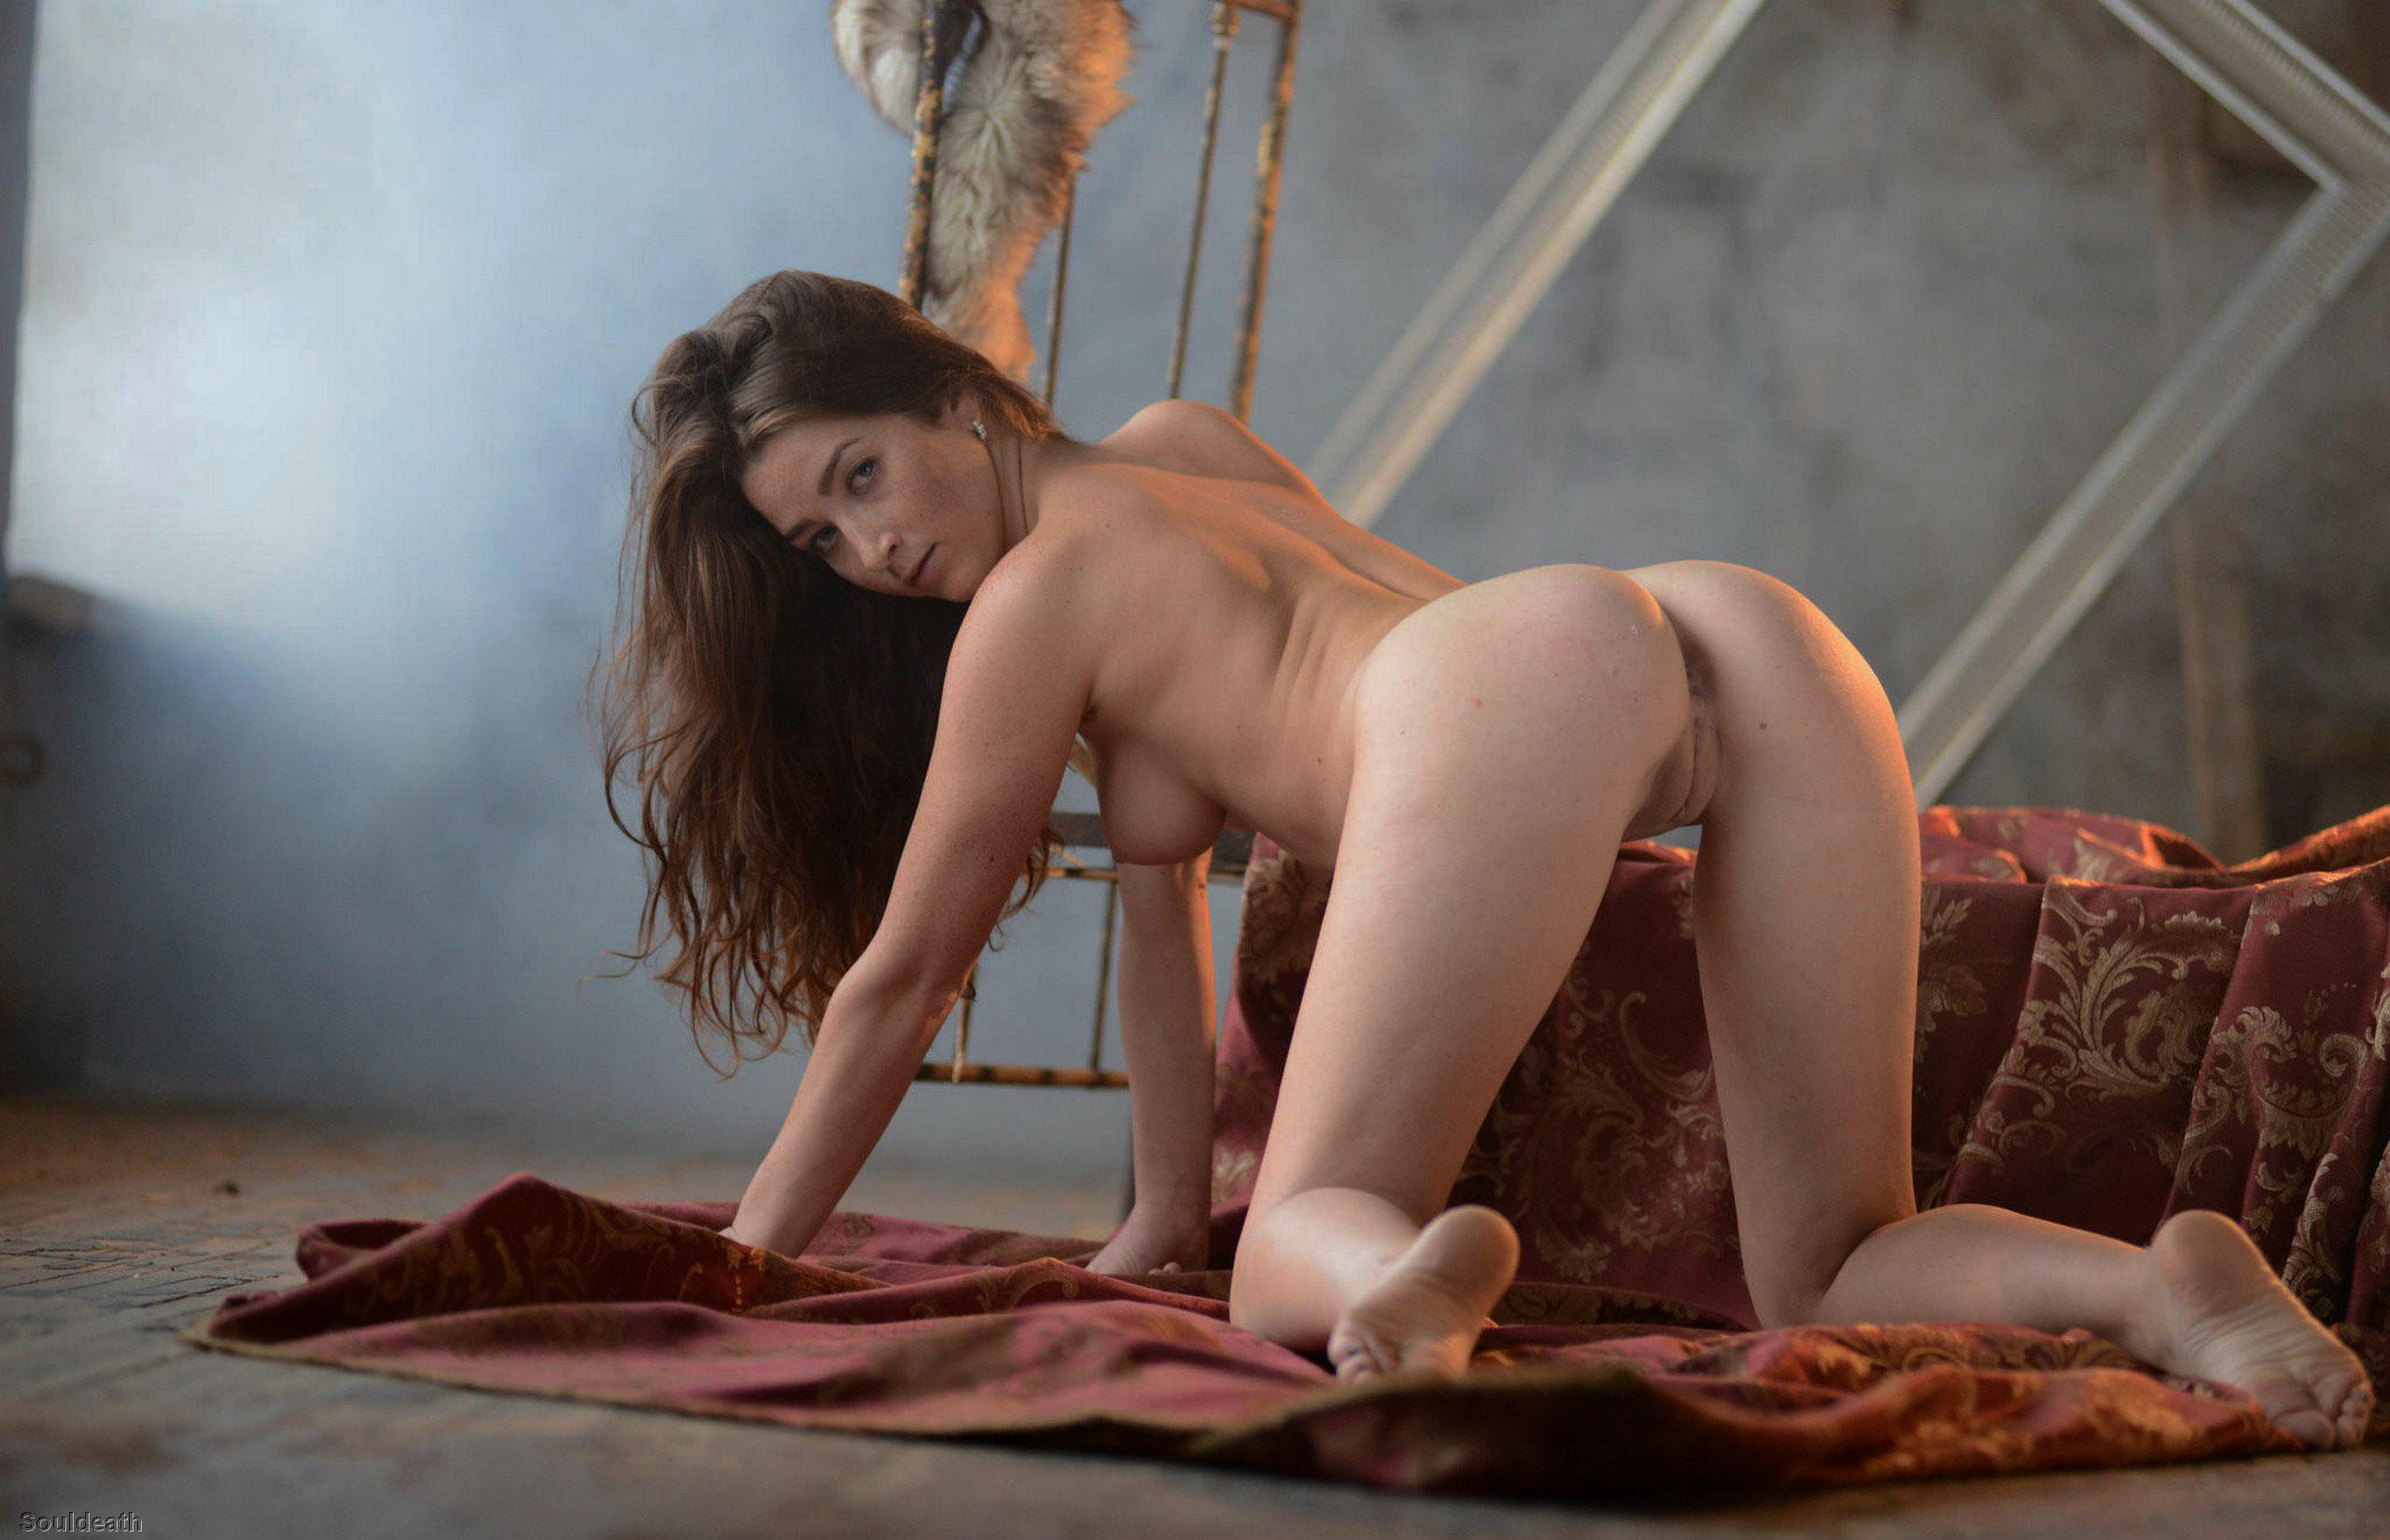 Free erotic art galleries